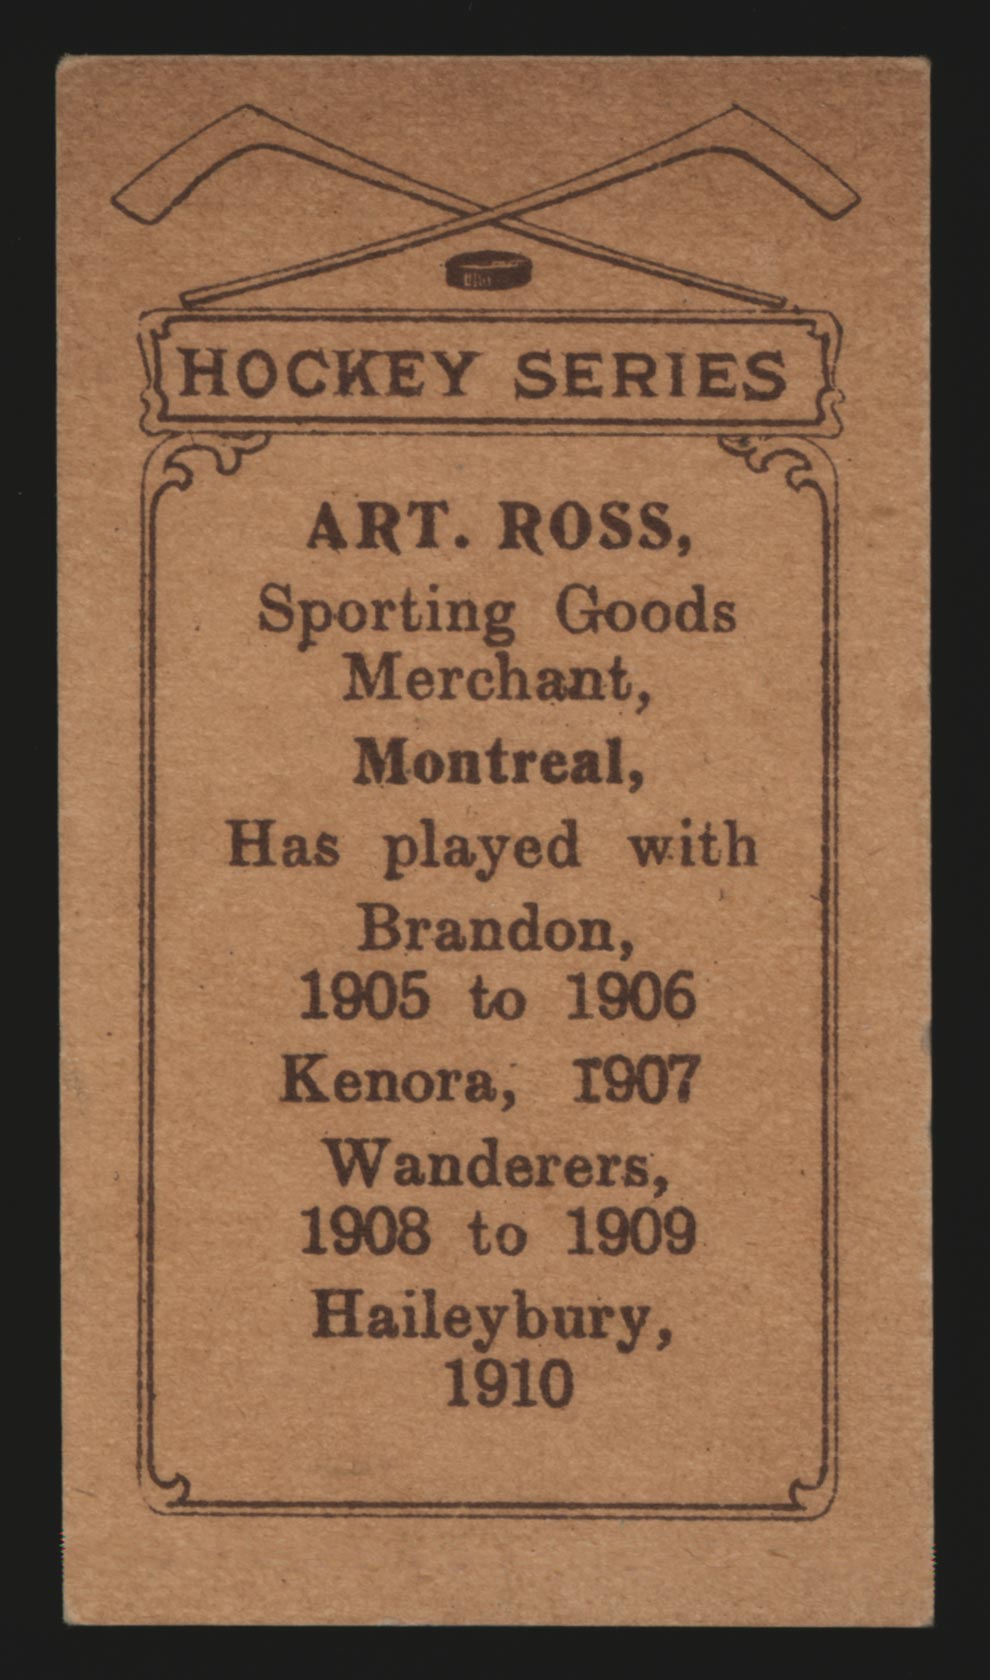 1910-1911 C56 Imperial Tobacco #8 Art Ross Haileybury - Back